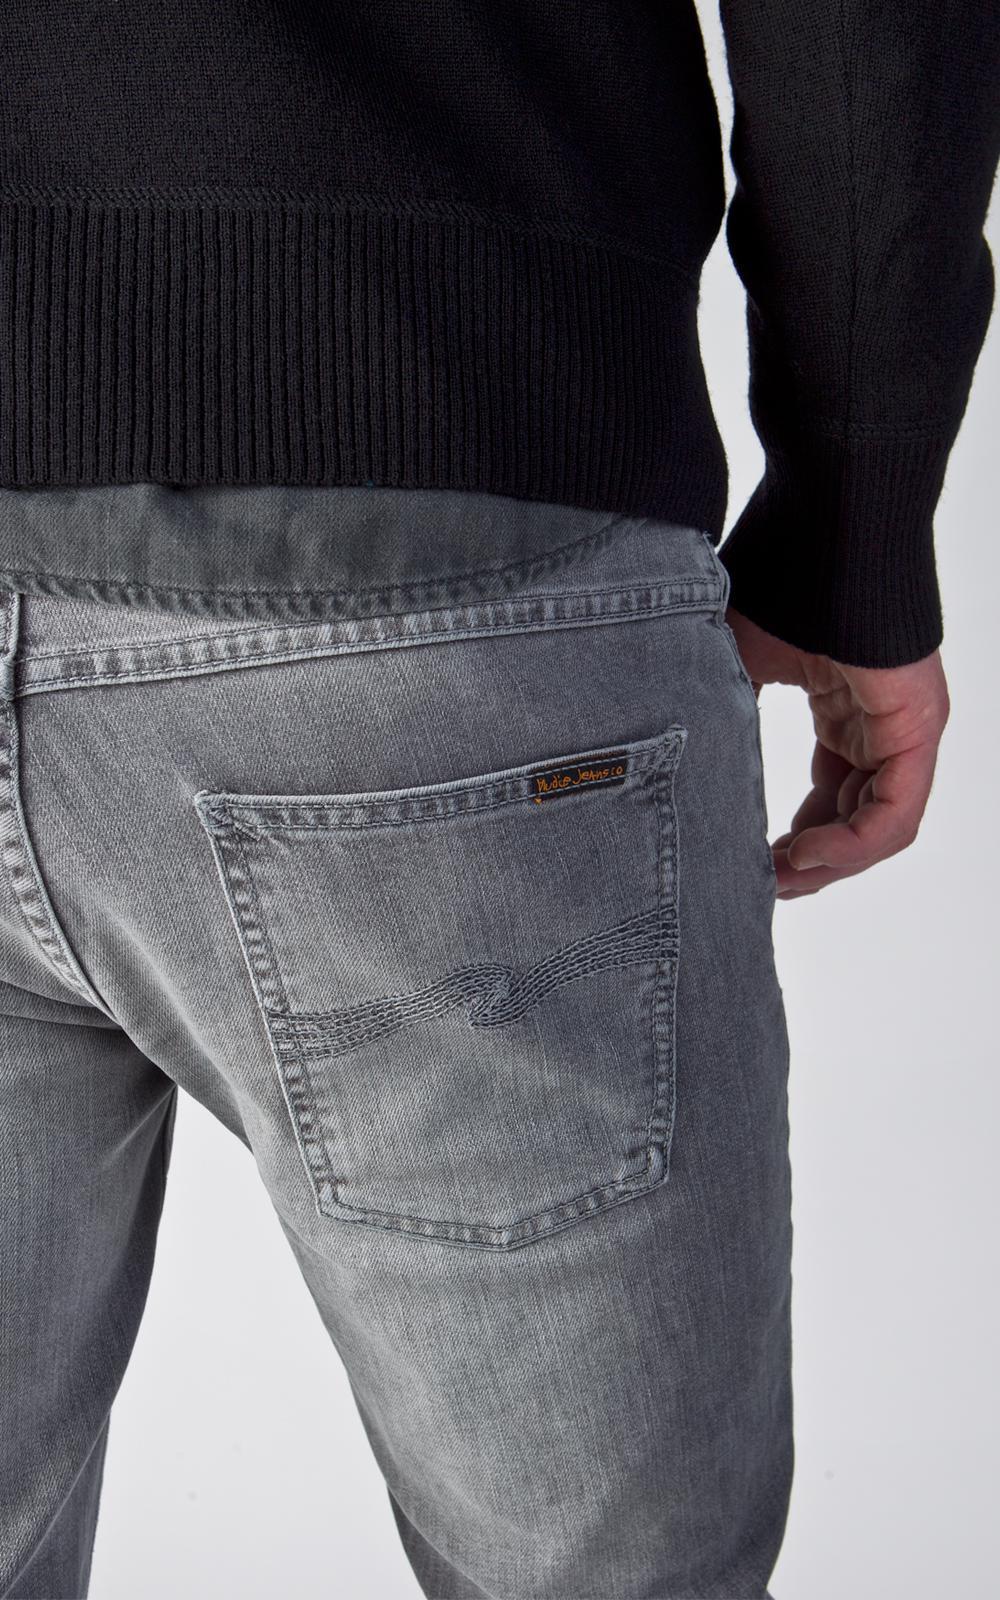 Nudie Jeans Denim Nudie Jeans Thin Finn Dark Pavement 11.5oz for Men